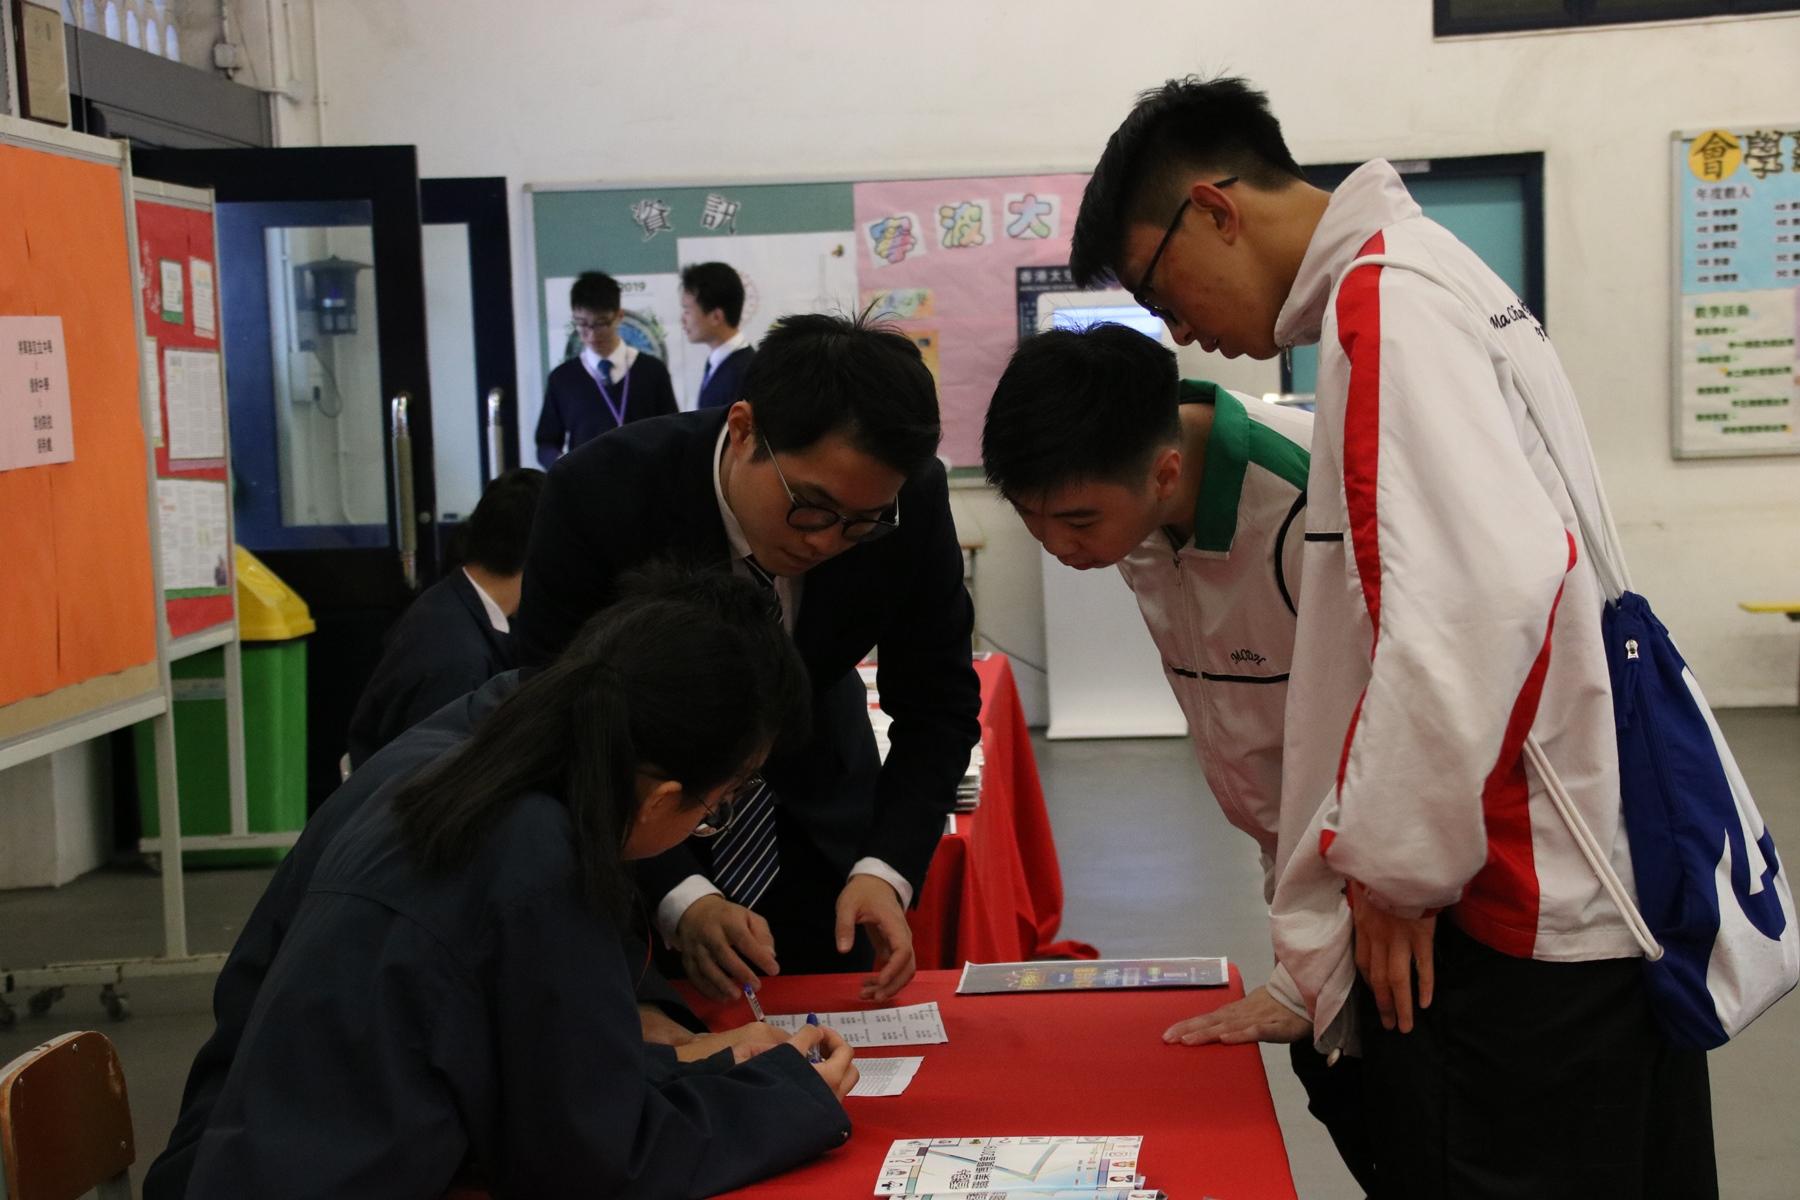 http://npc.edu.hk/sites/default/files/img_9197_1.jpg